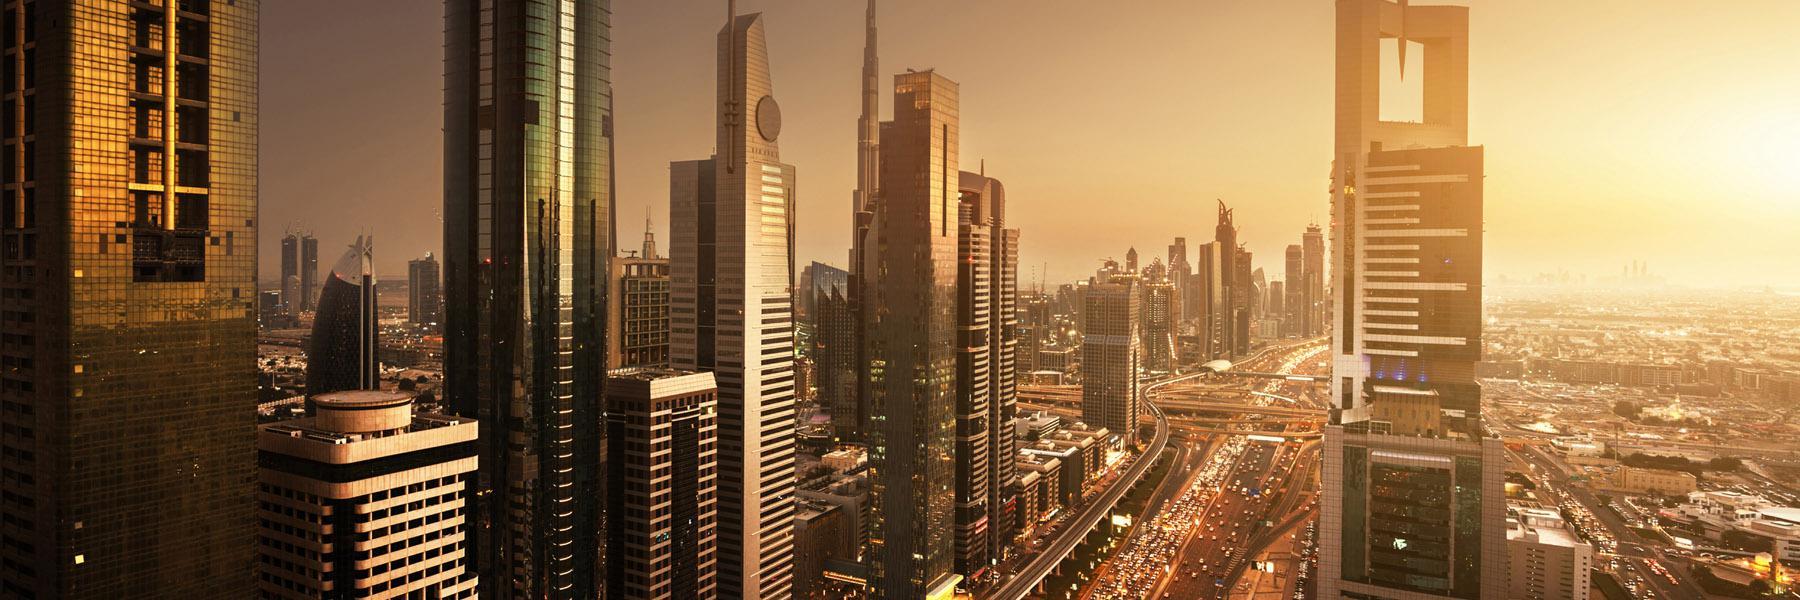 Close-up of Dubai's skyline including Burj Khalifa at the Golden Hour